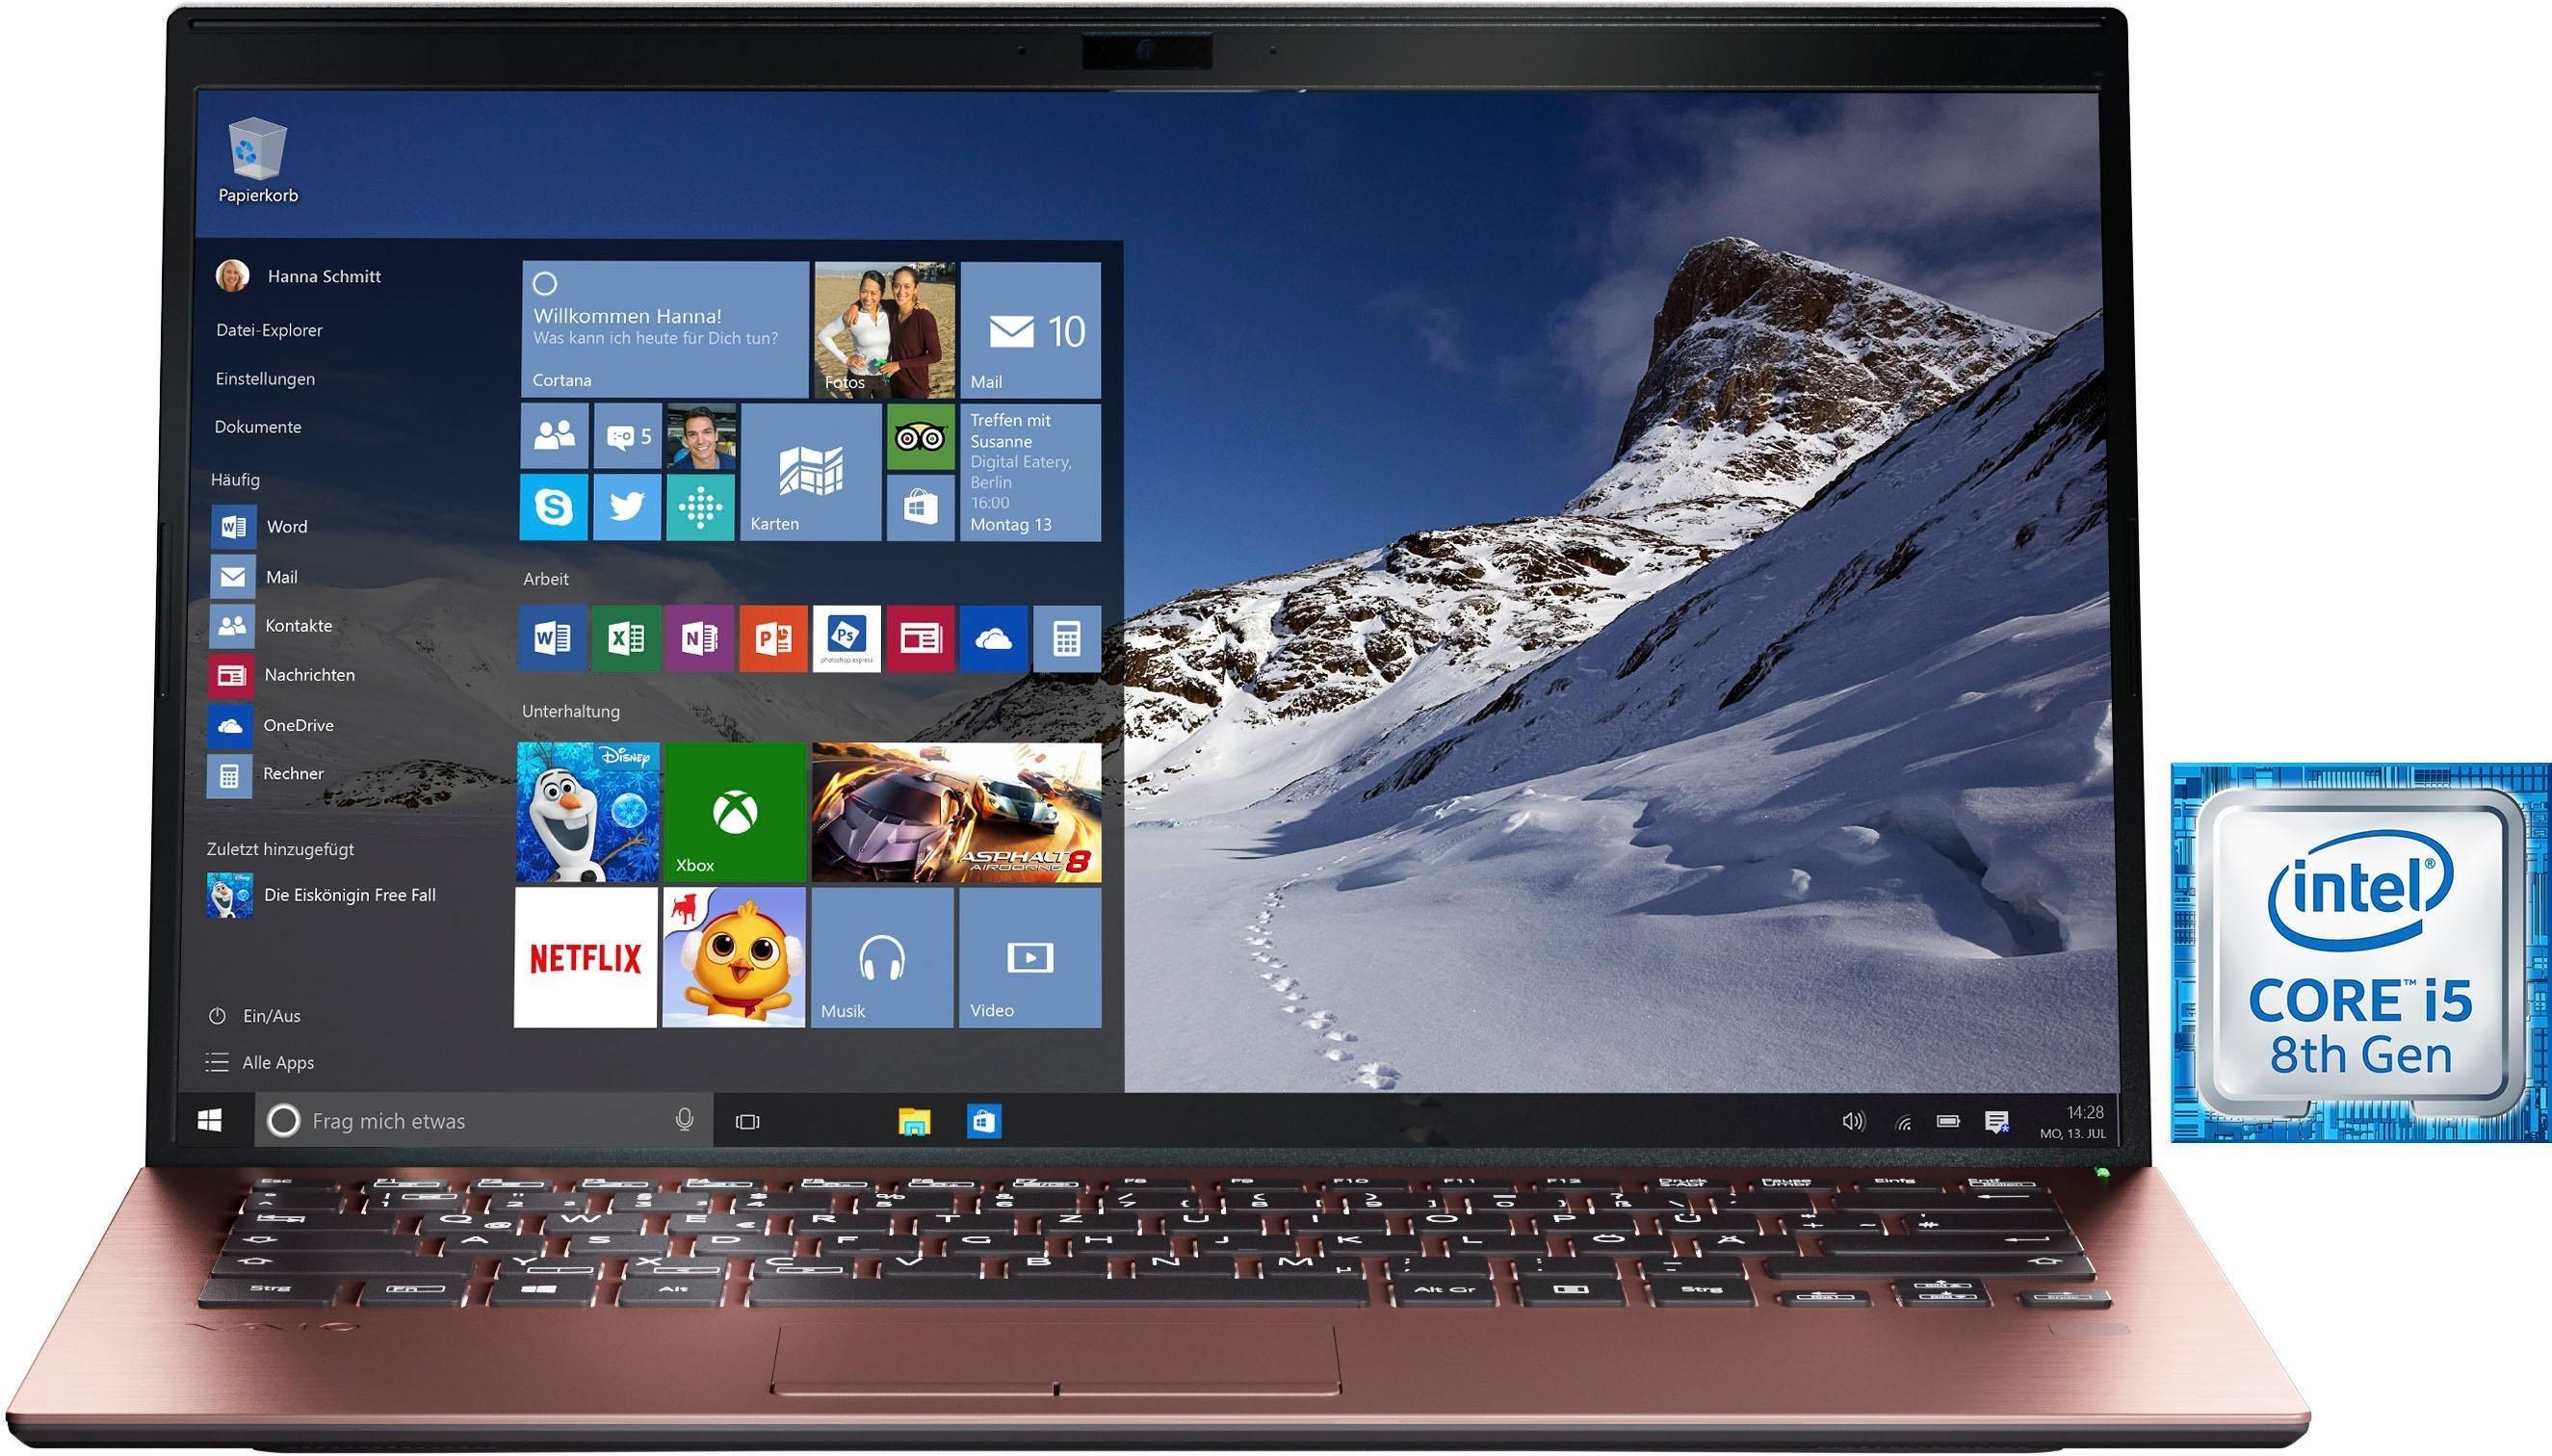 SX14 Notebook (35,56 cm/14 Zoll, Intel Core i5, 256 GB SSD, Windows 10 Professional, Anti-Glare Full HD IPS Display, Carbon Chassis, TPM 2.0,